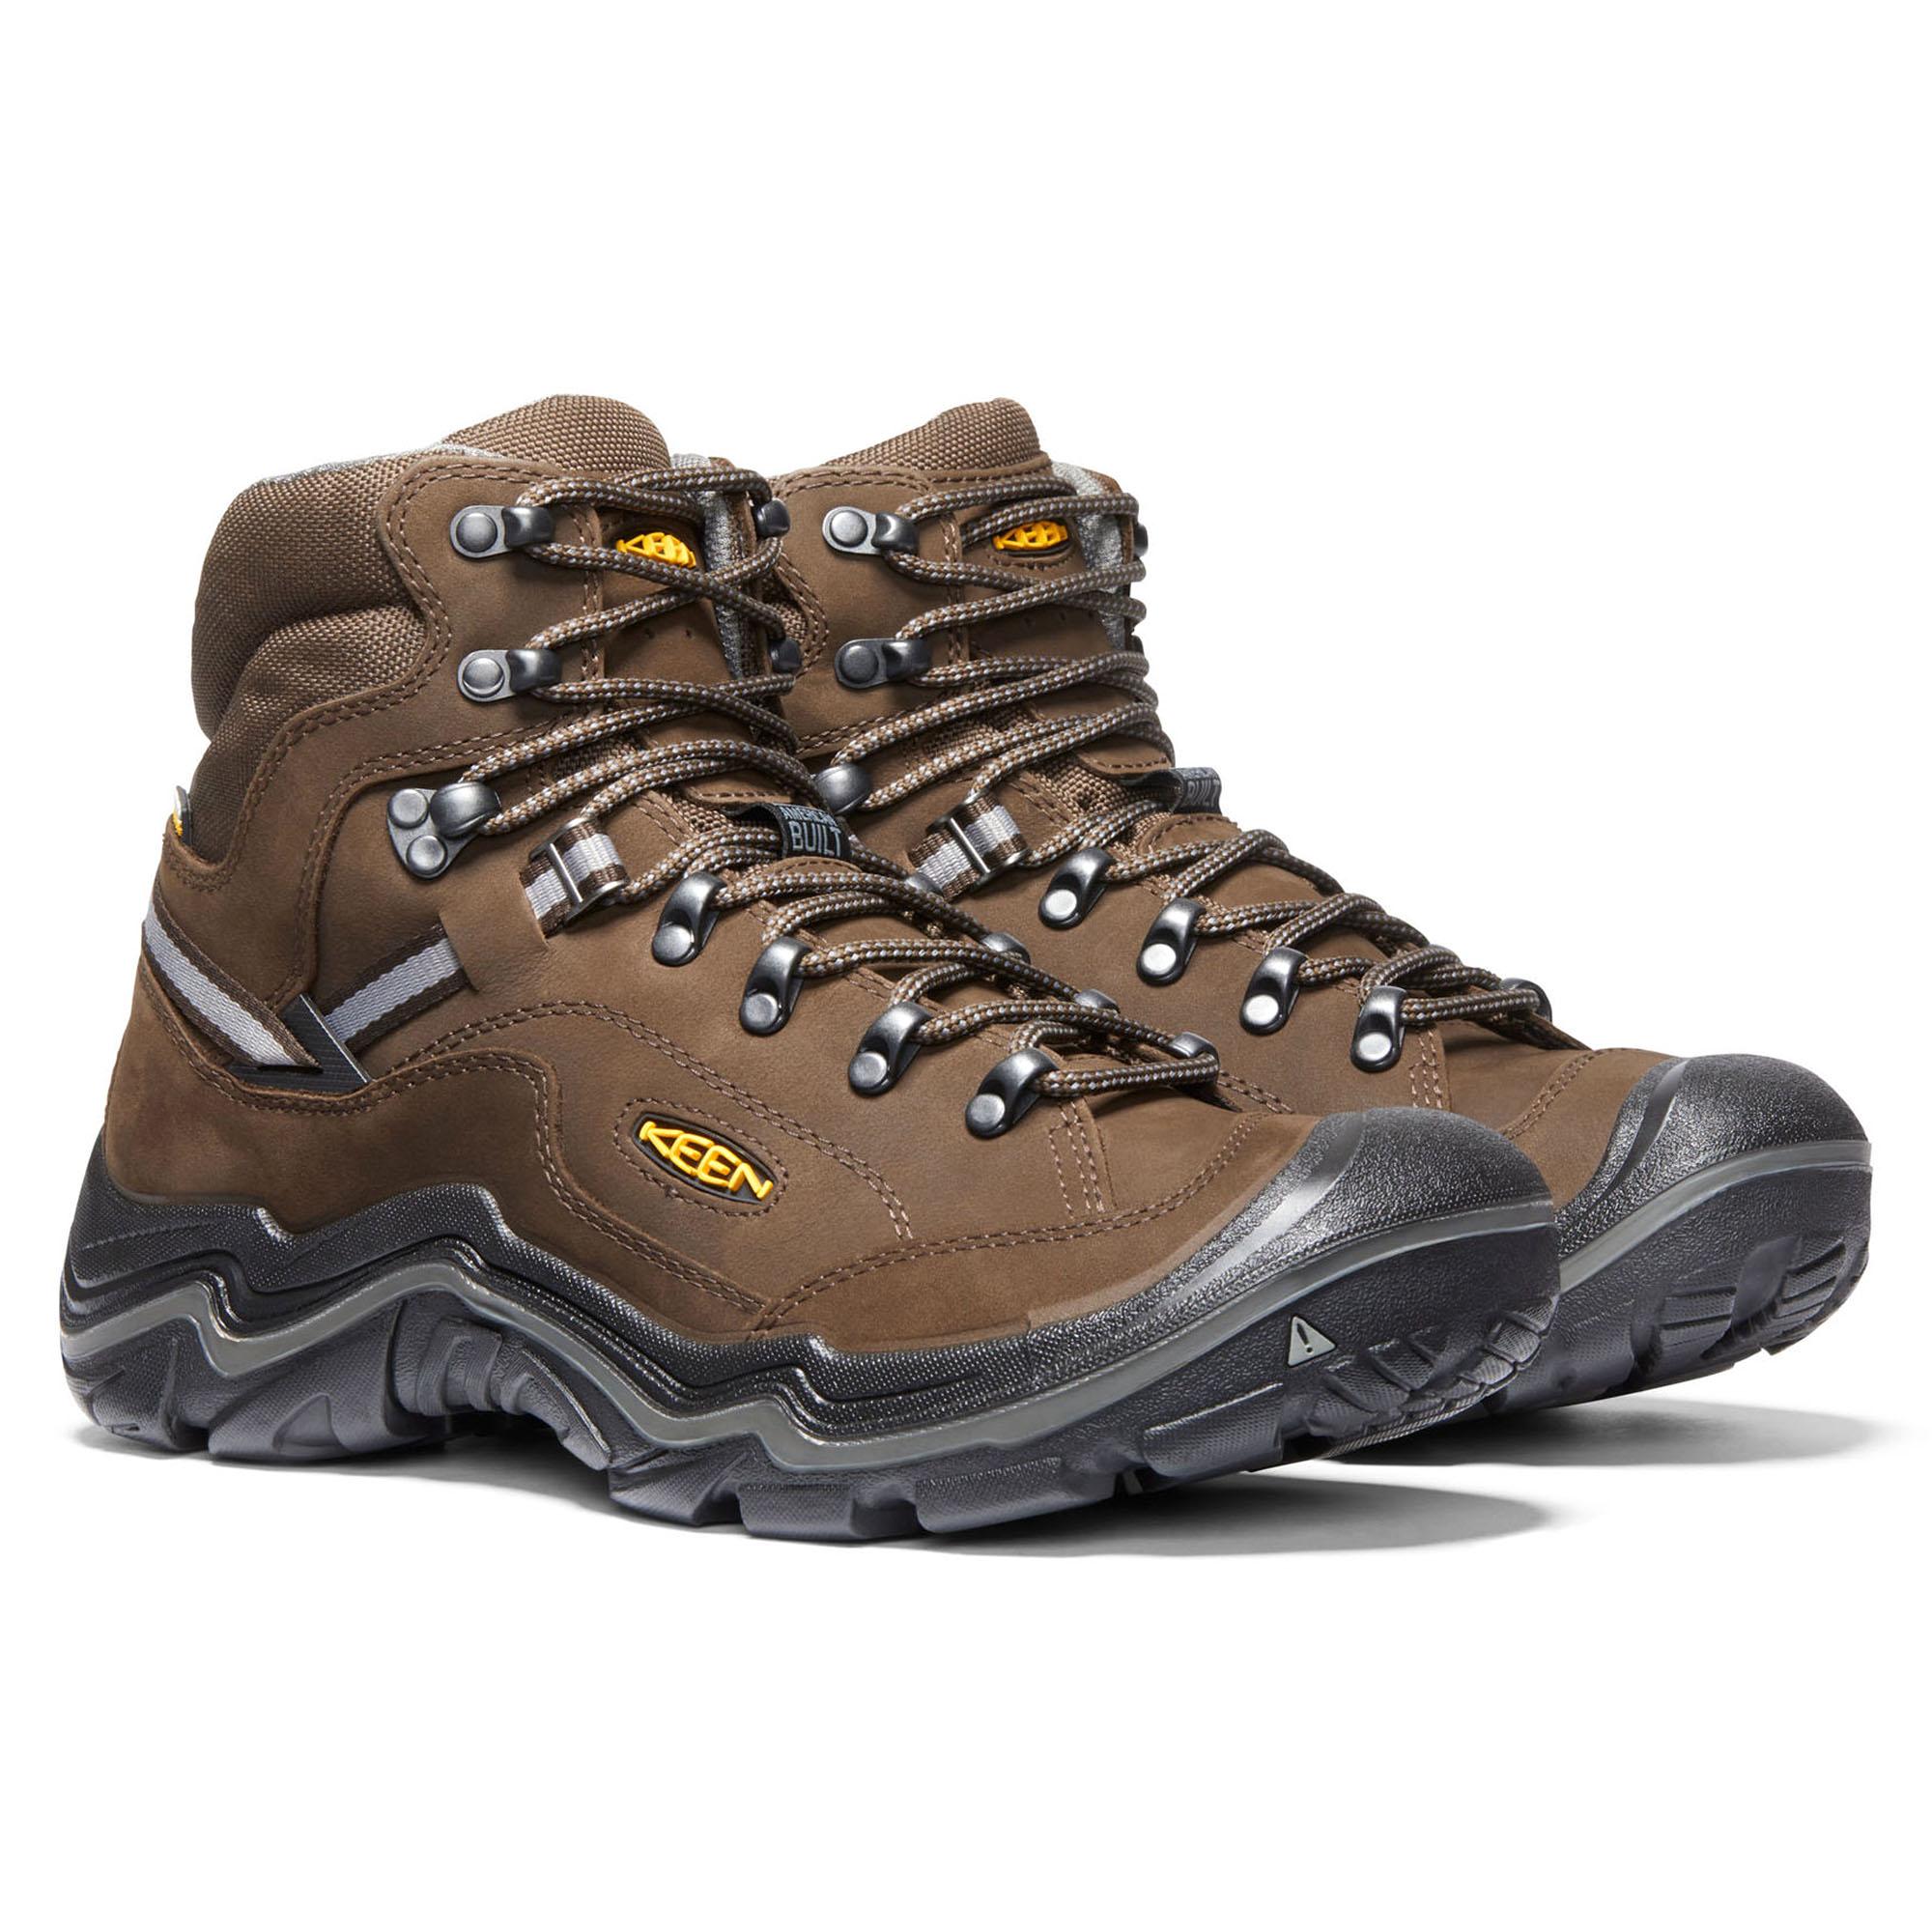 bcde3d72cc6 Keen Men's Durand II Mid Waterproof Hiking Boots